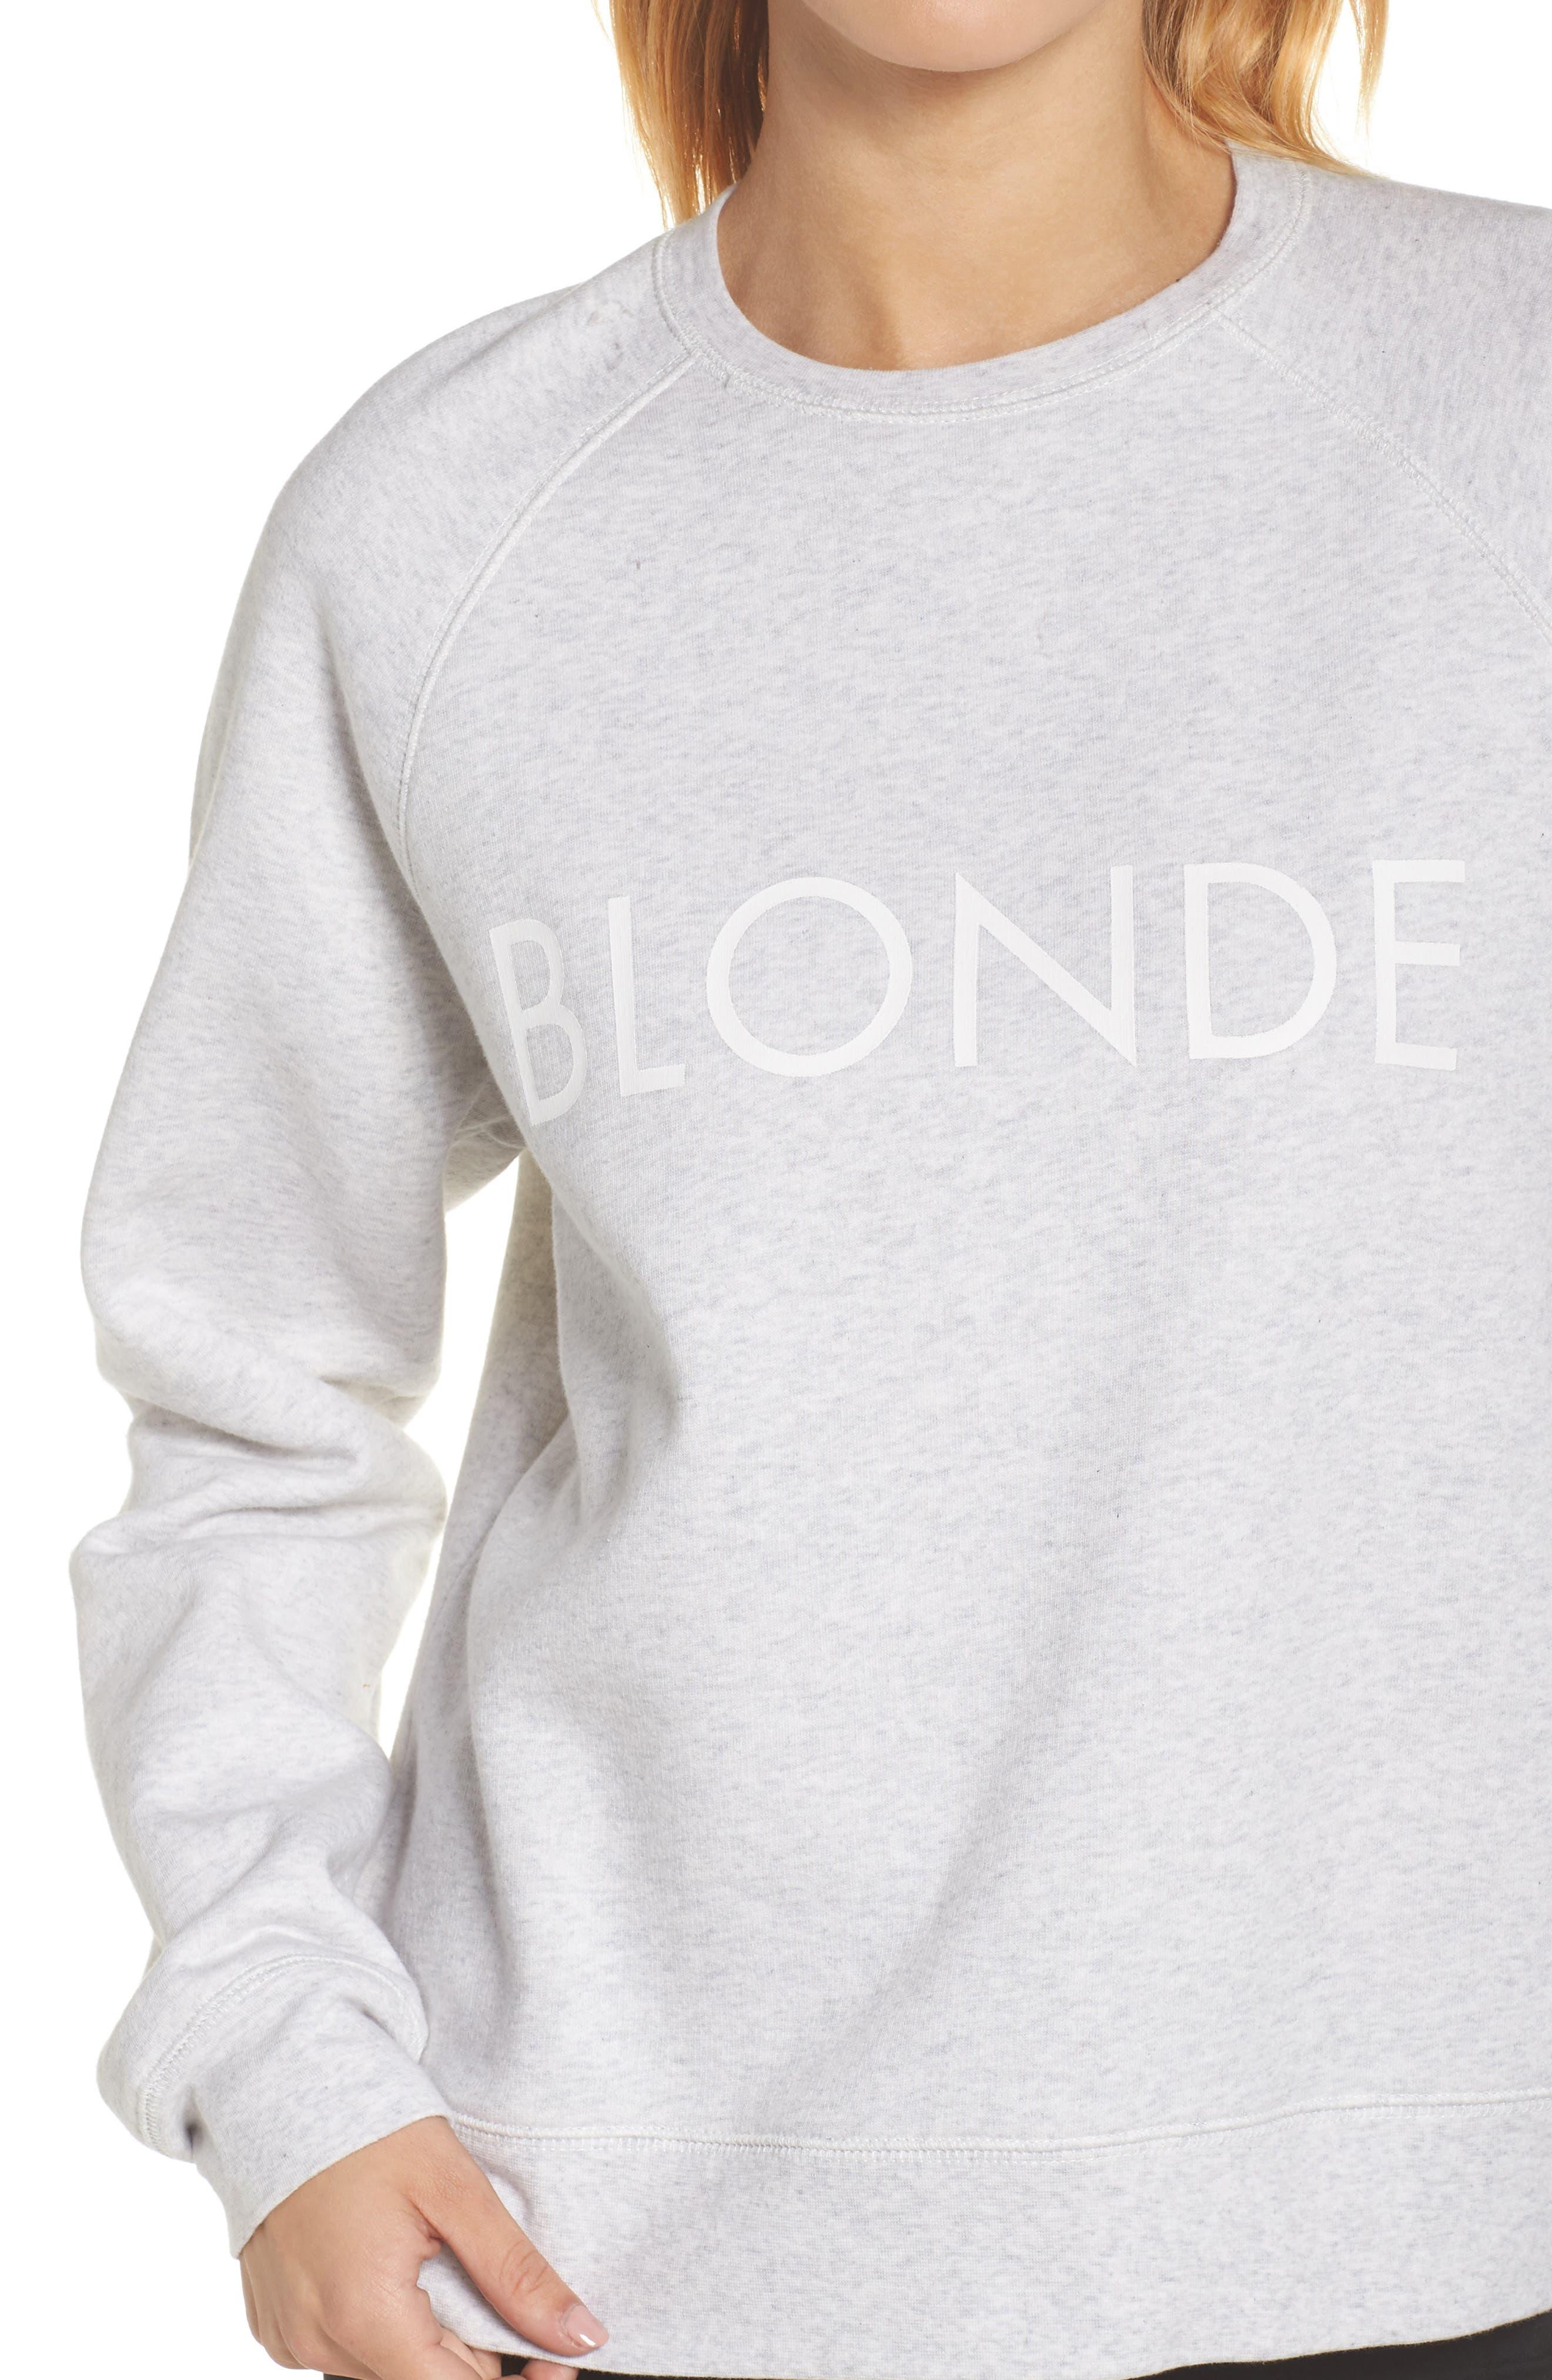 Blonde Sweatshirt,                             Alternate thumbnail 4, color,                             250